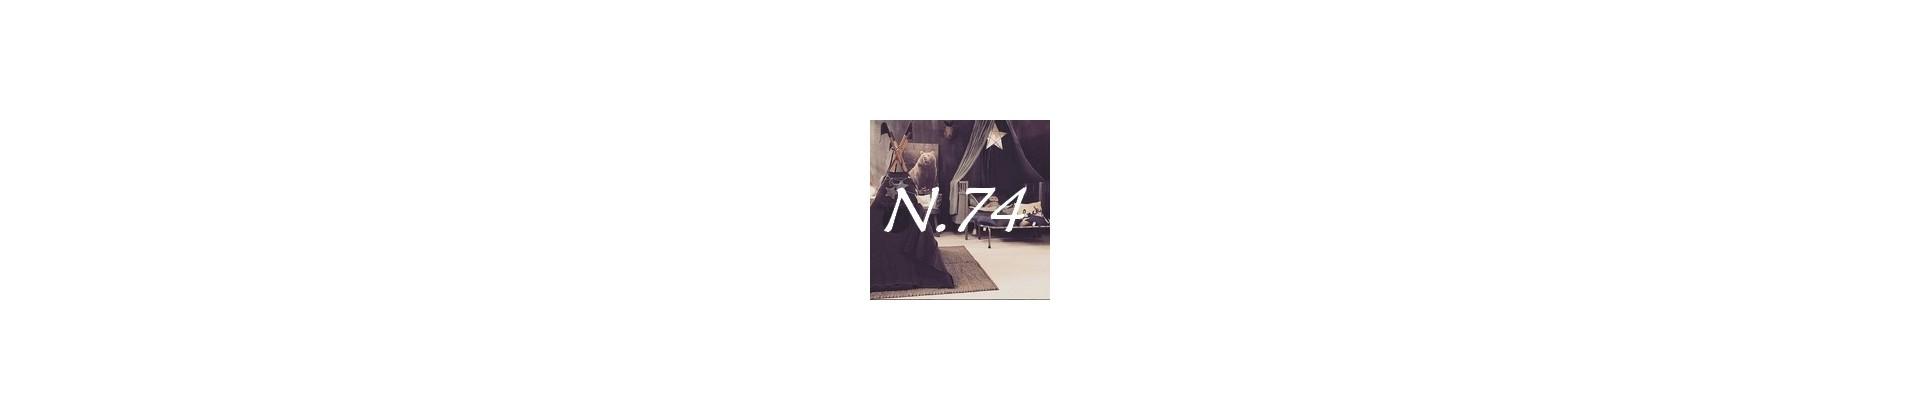 Numero 74 on sale